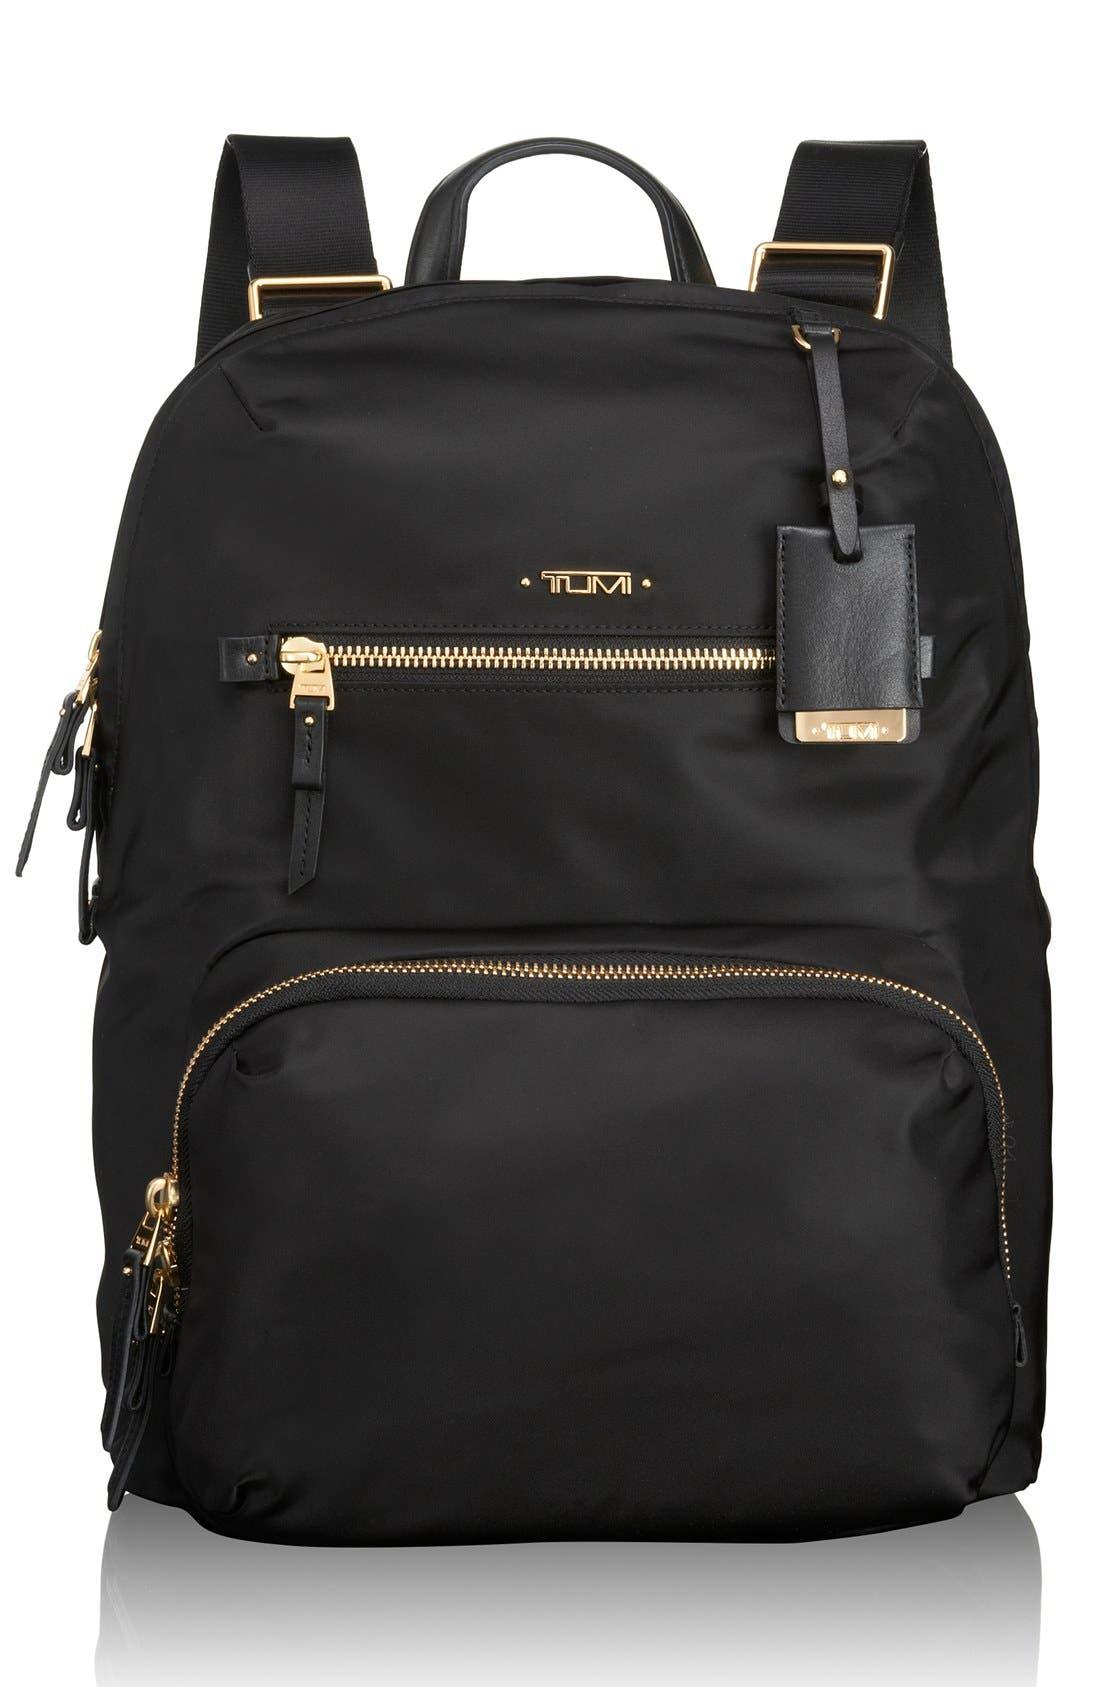 Alternate Image 1 Selected - Tumi 'Voyageur Halle' Nylon Backpack